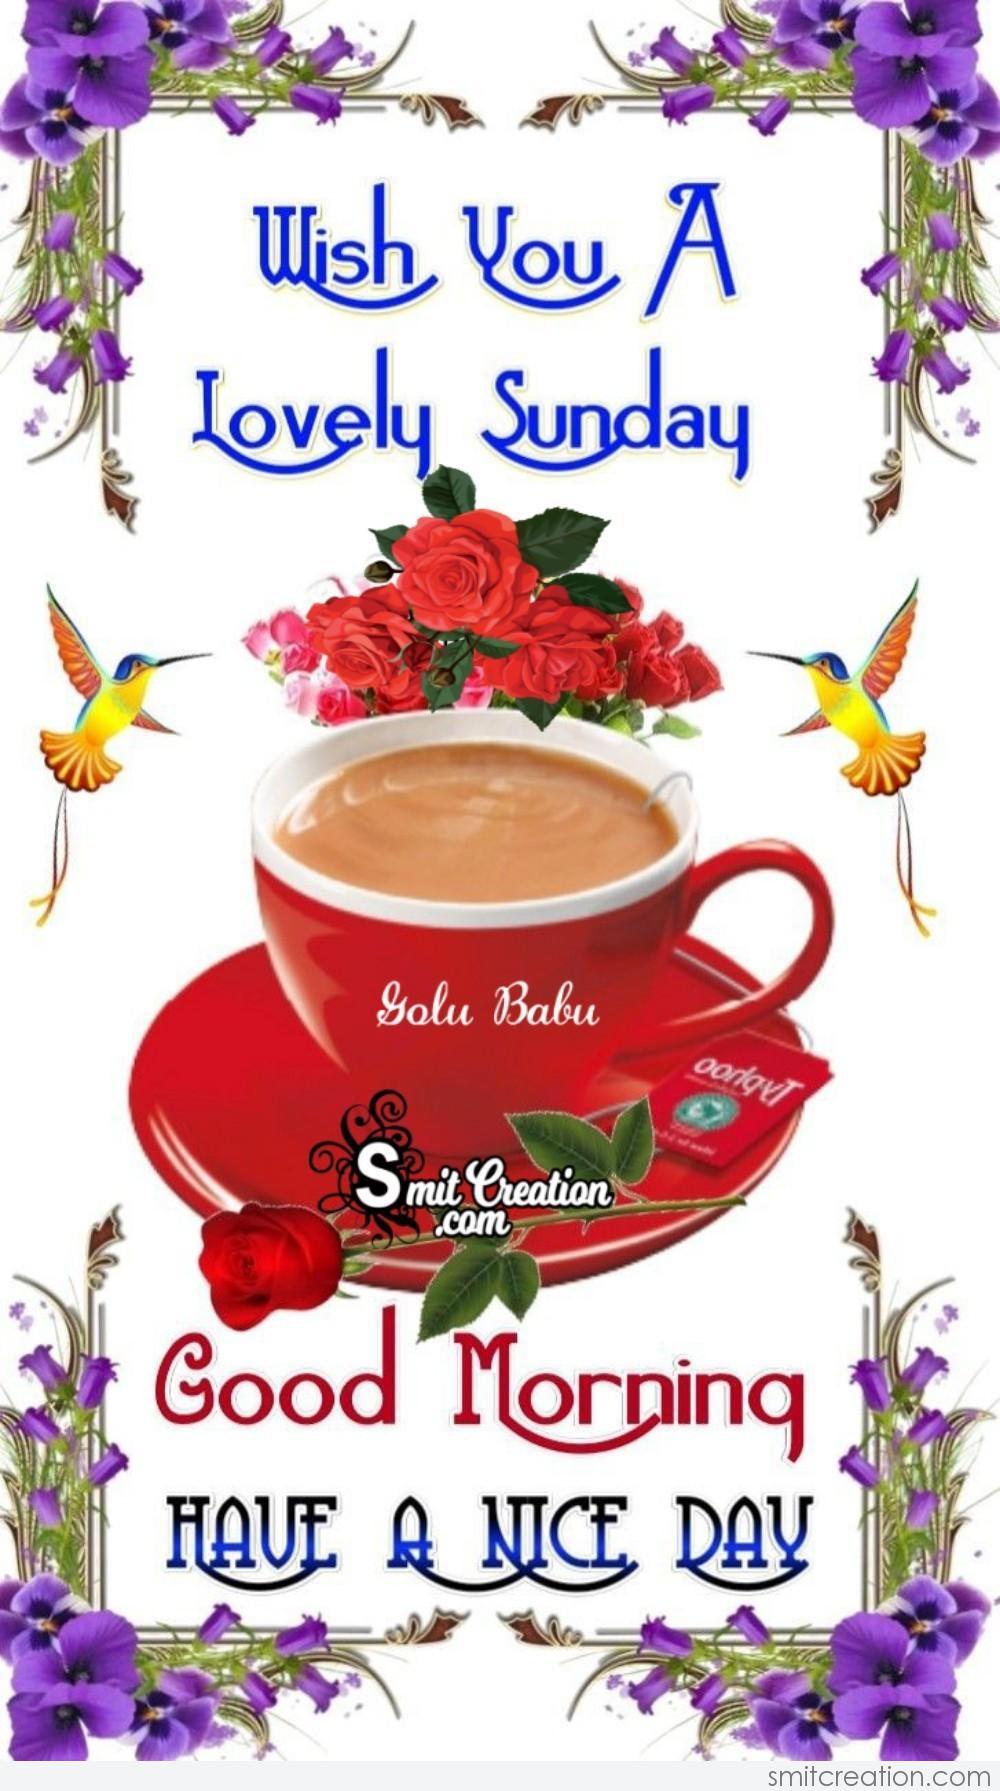 Wish You A Lovely Sunday   SmitCreation.com